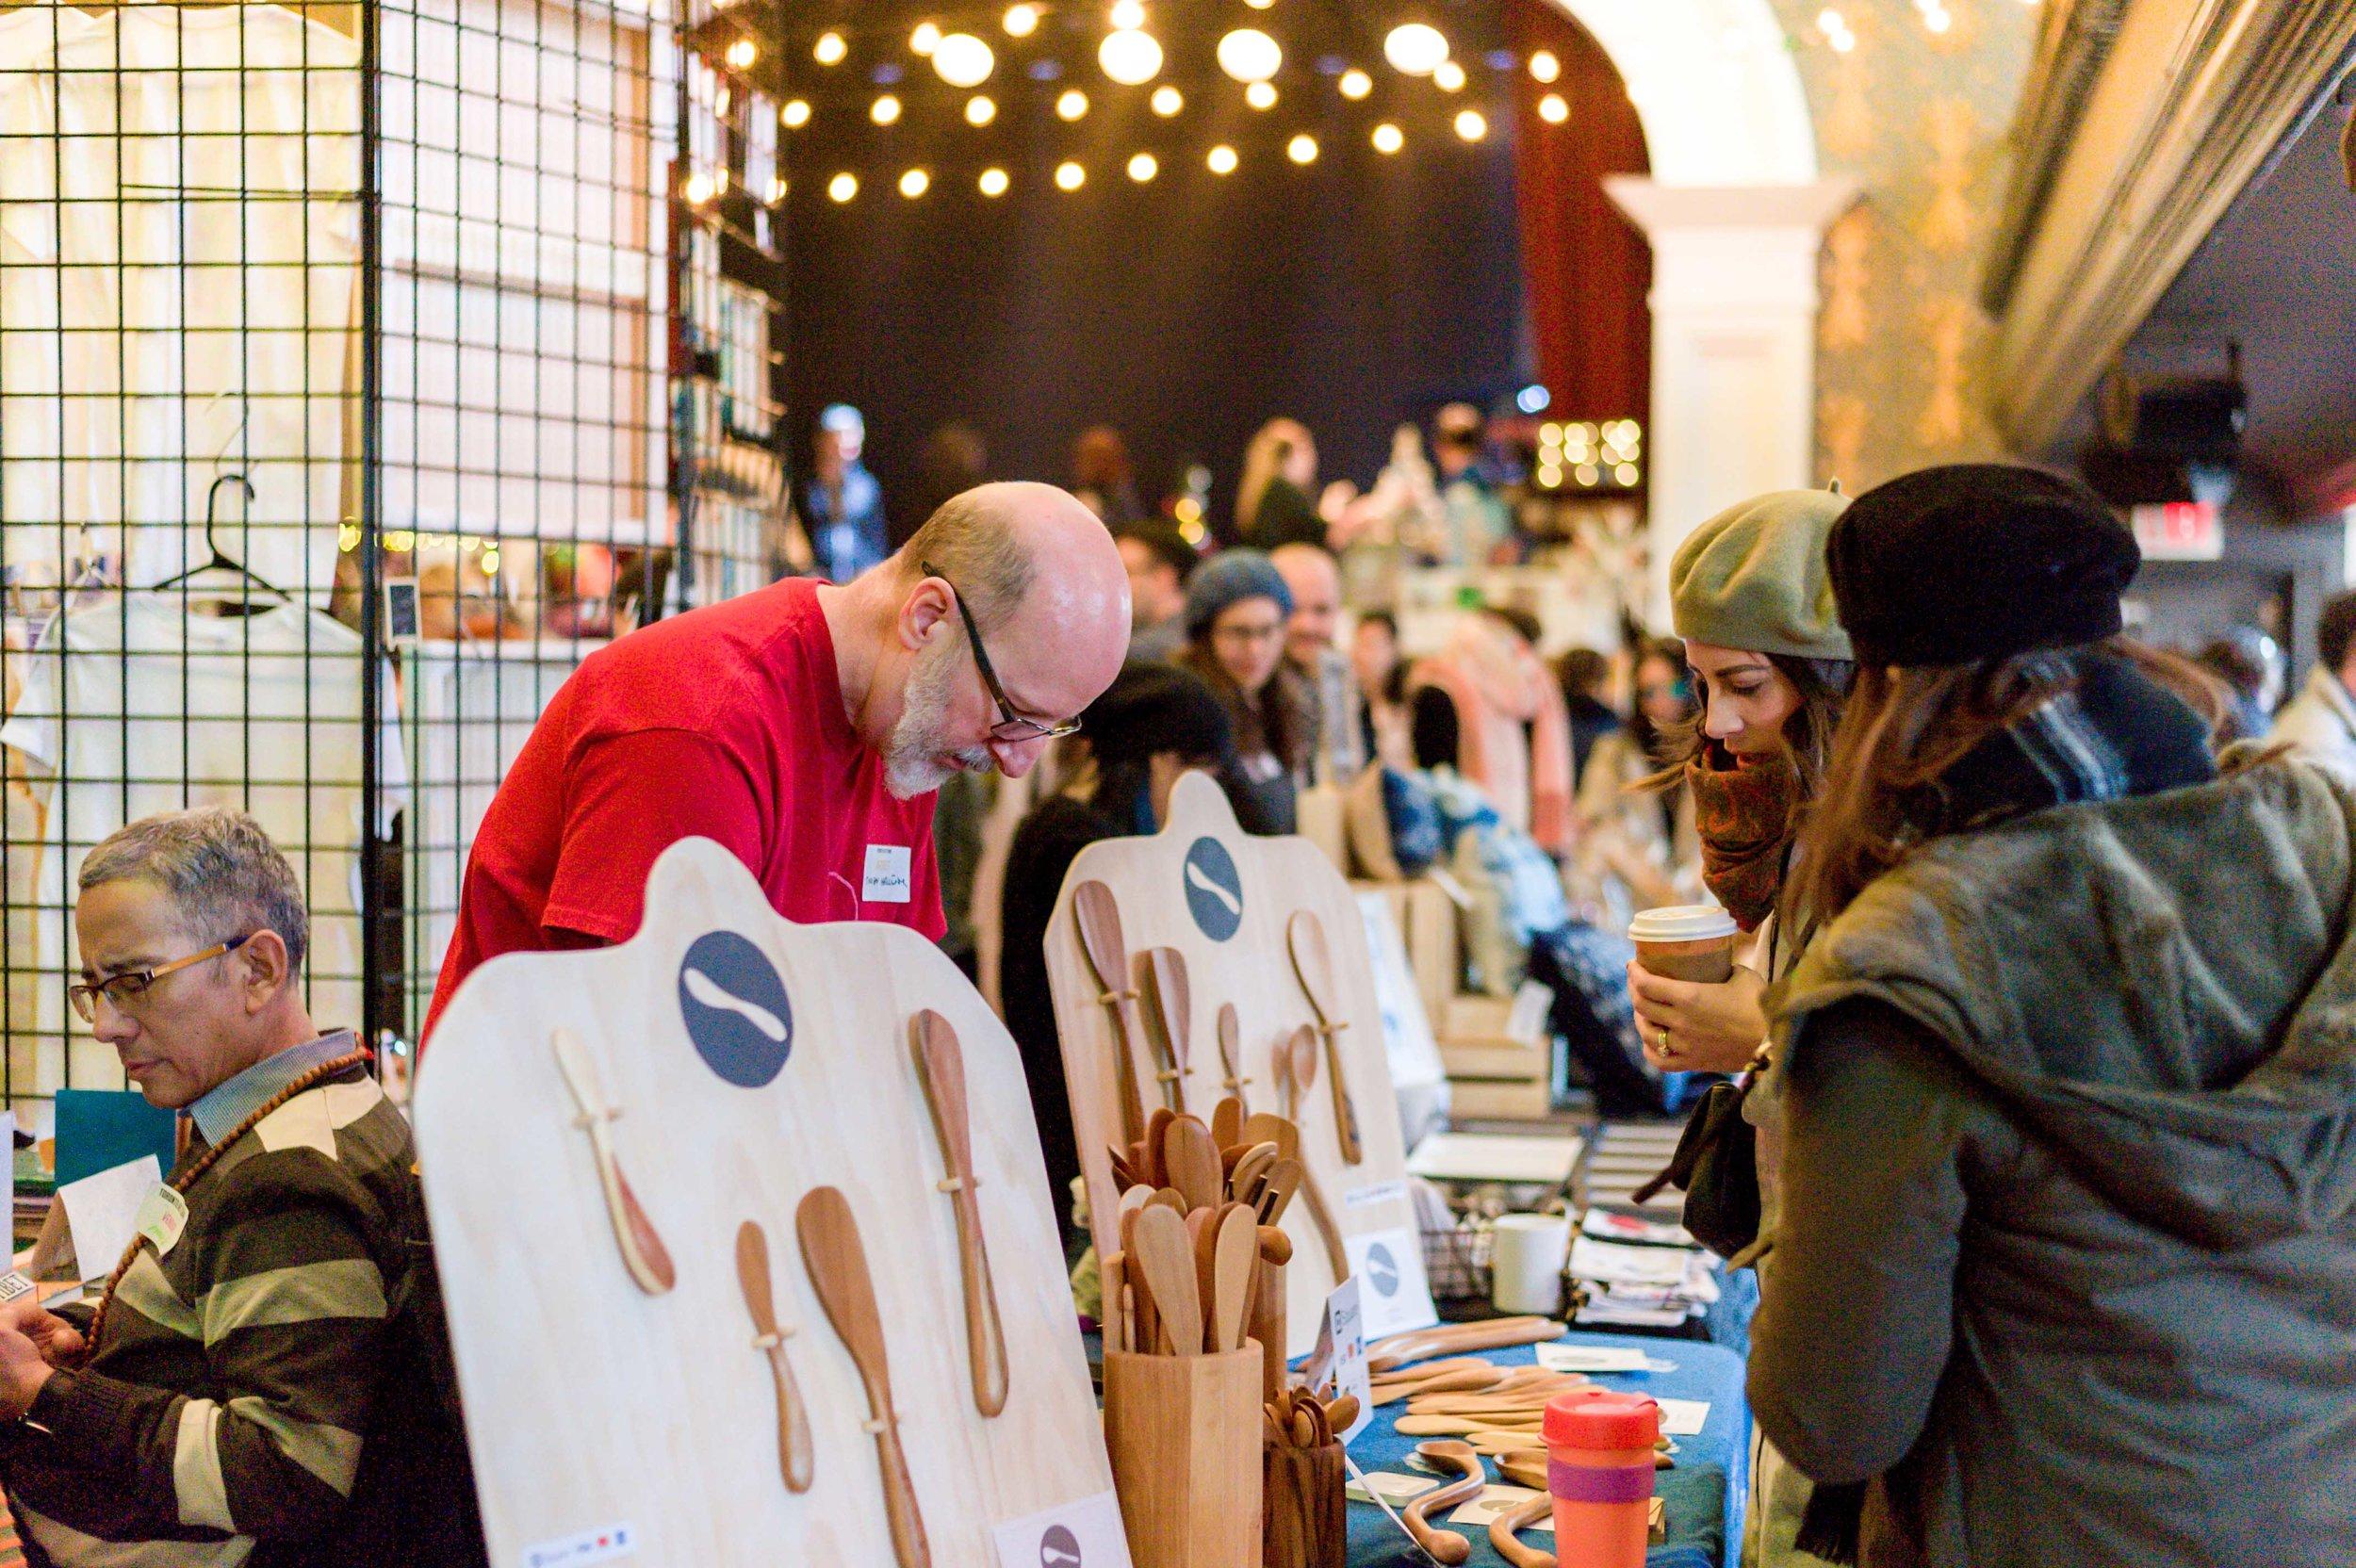 Toronto Art Crawl - Christmas Market-20_2 - Copy.jpg